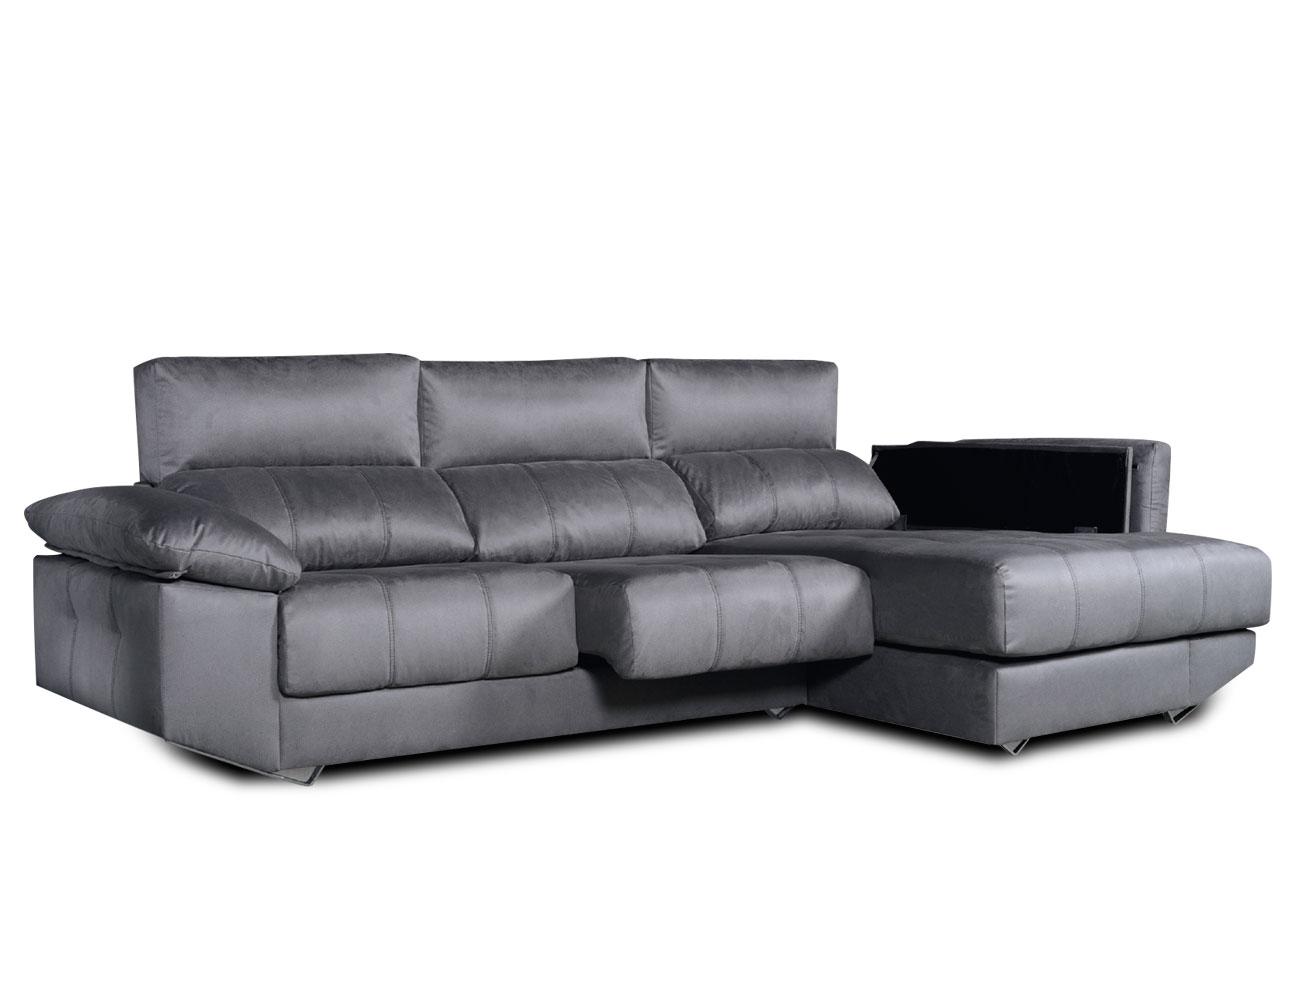 Sofa chaiselongue arcon brazo mecanico tejido anti manchas 2